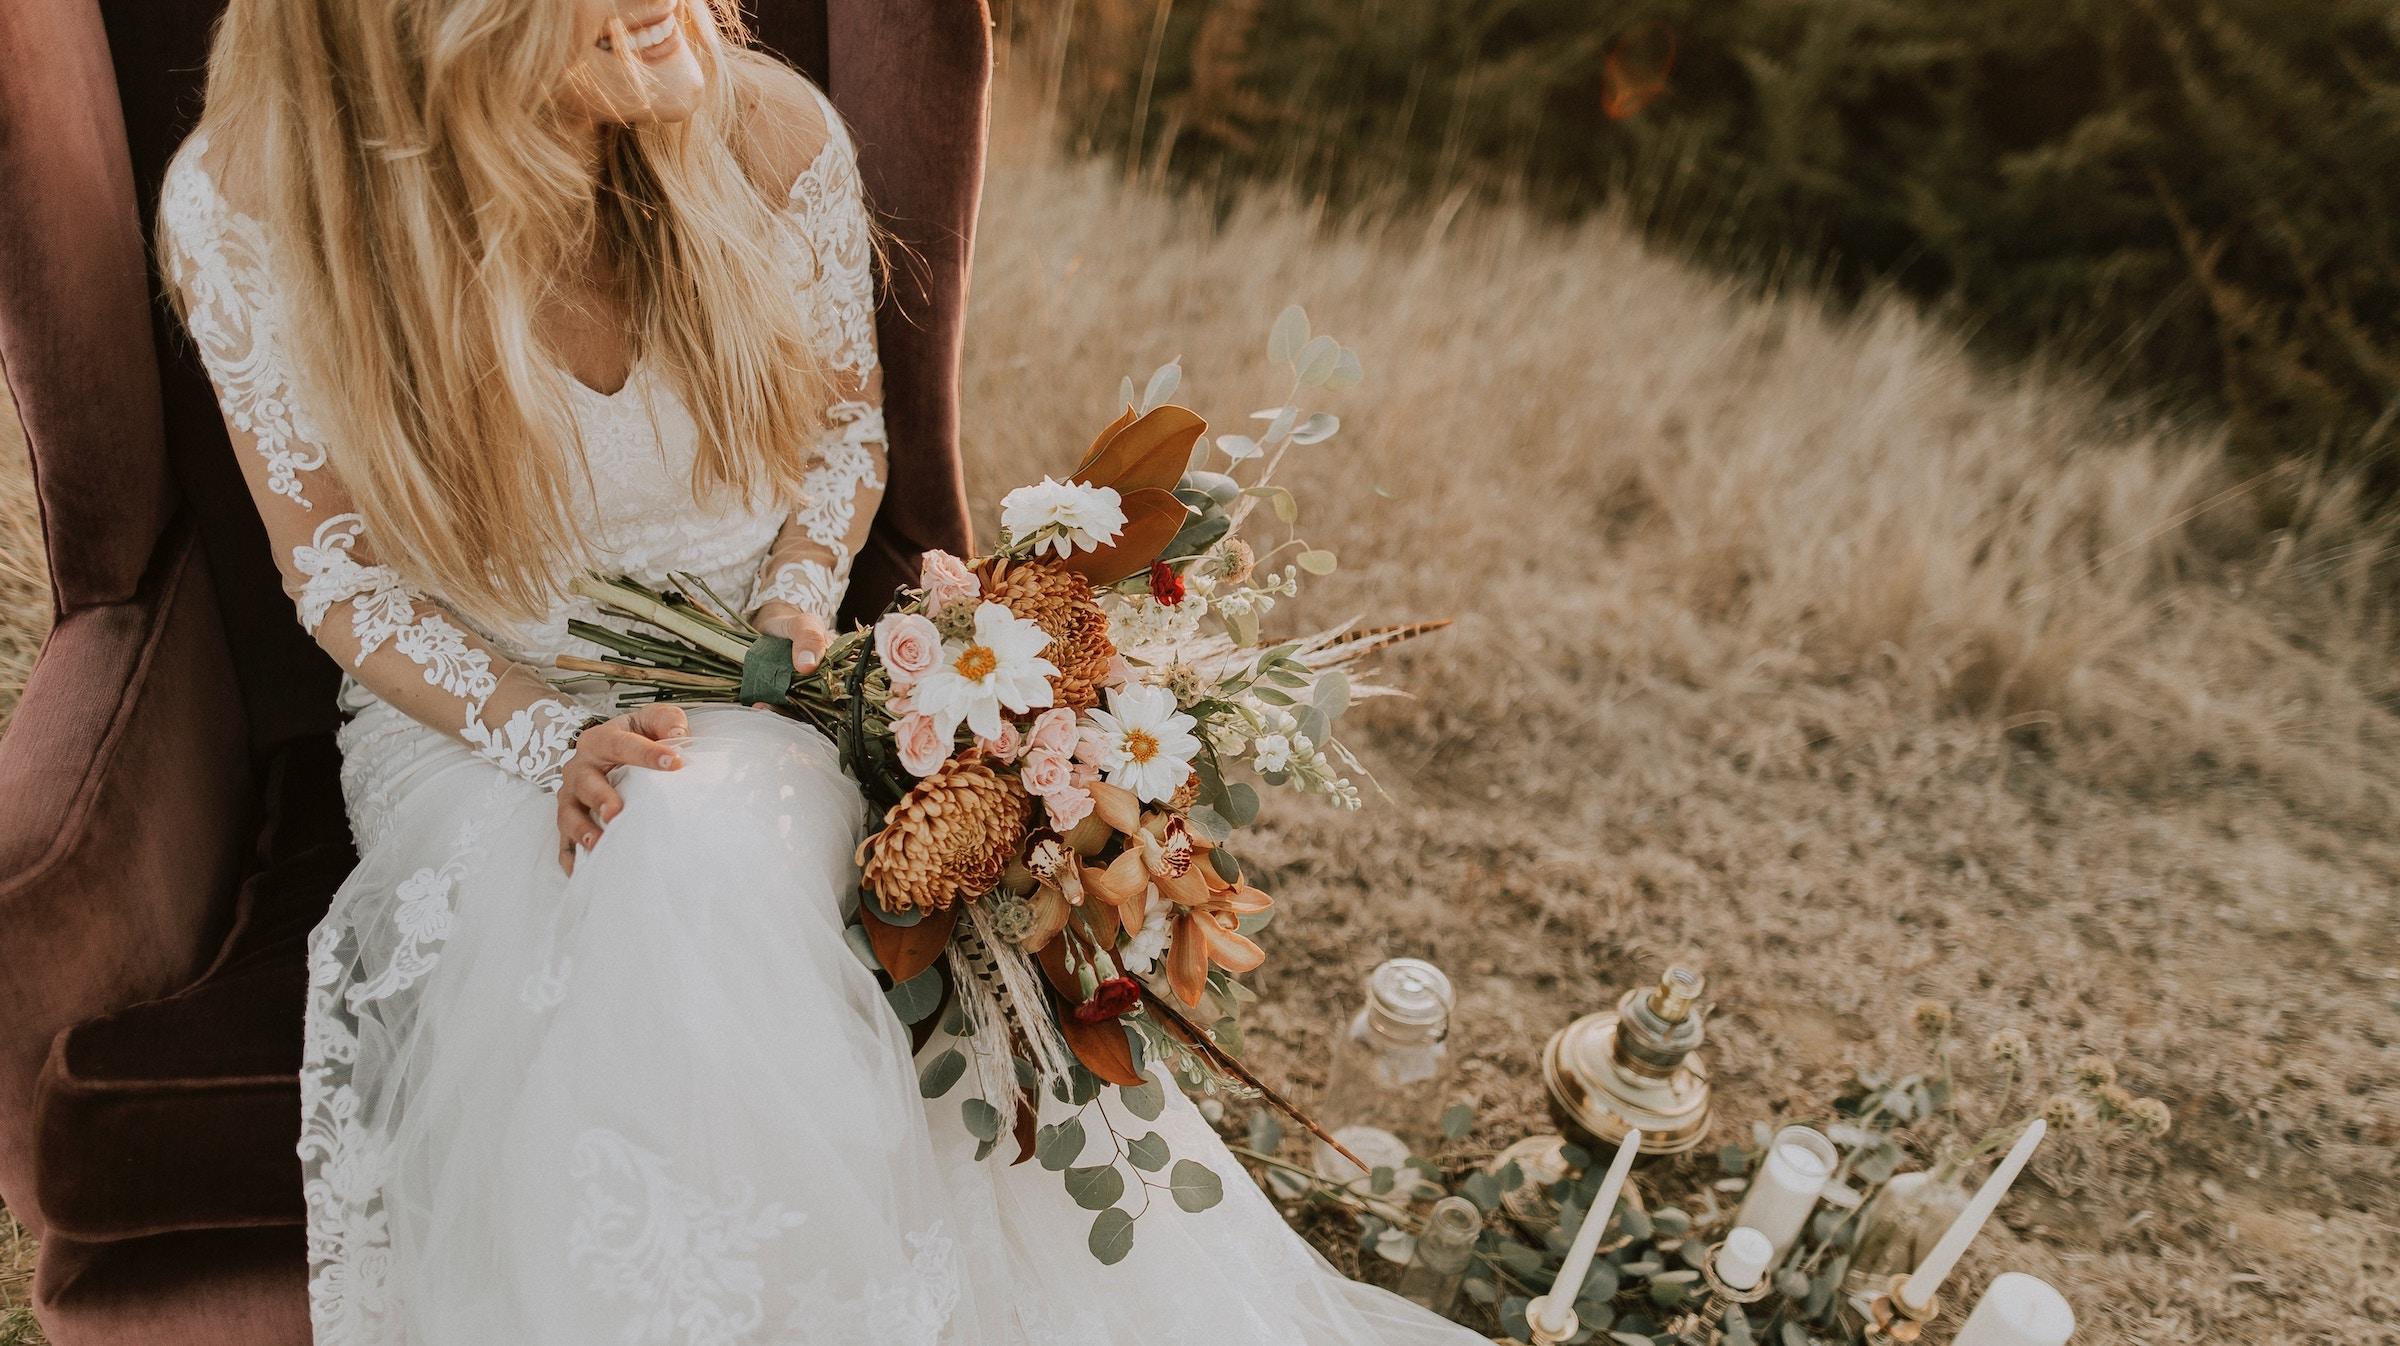 Wedding agency website development